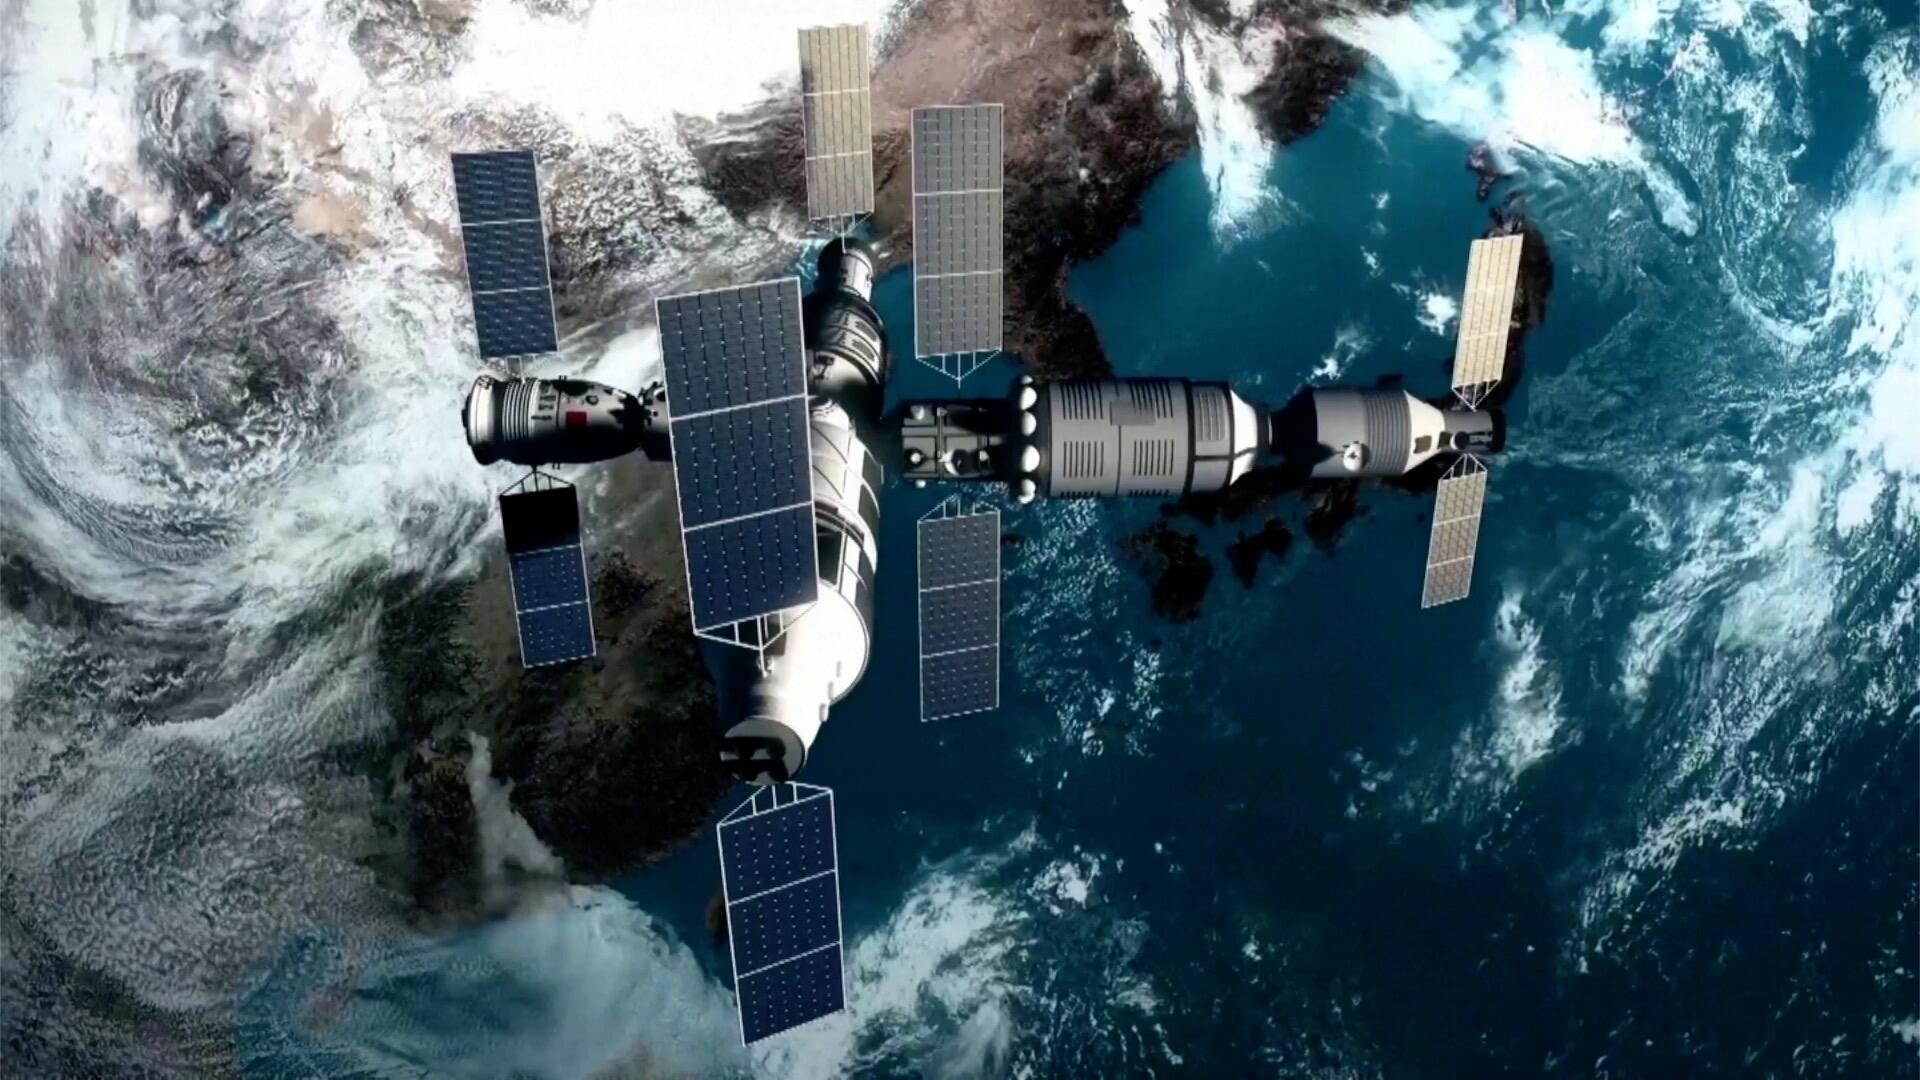 CHINA-SPACE-STATION-SCREENSHOT